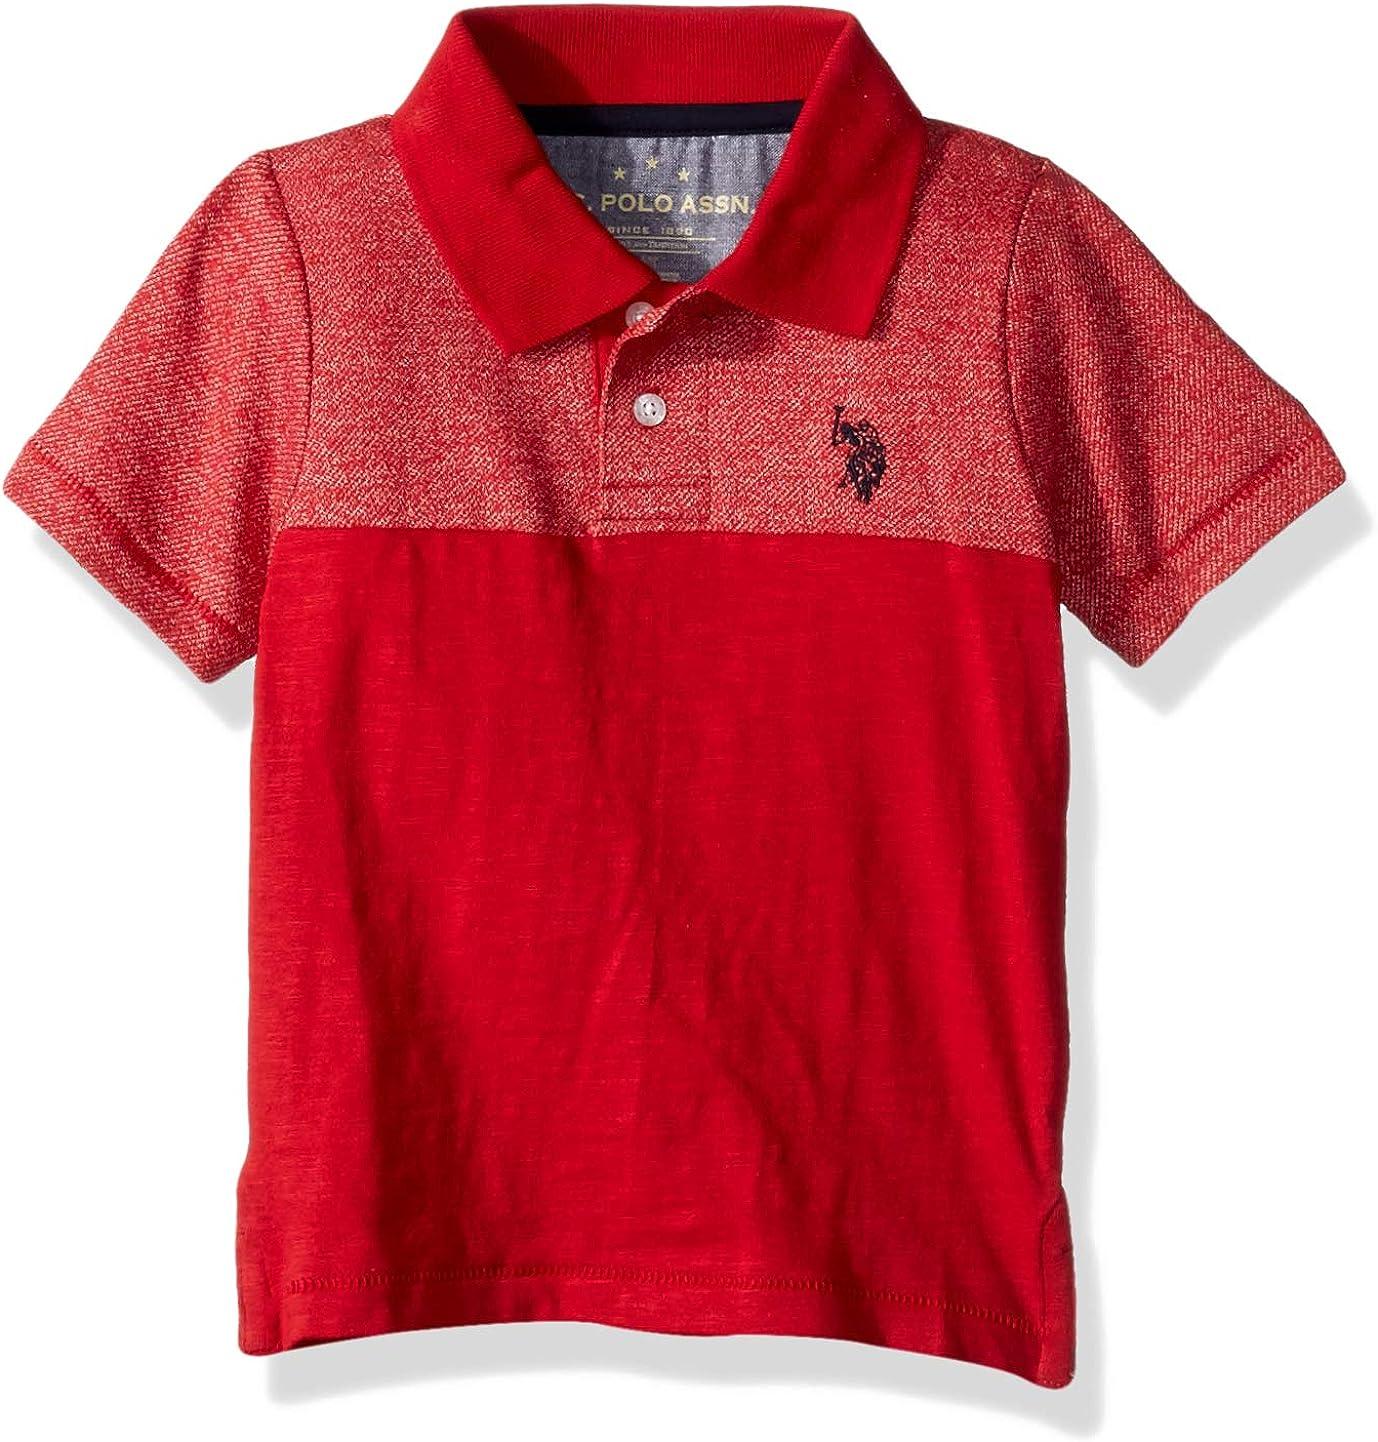 Polo Assn U.S Boys Short Sleeve Marled Pique Polo Shirt